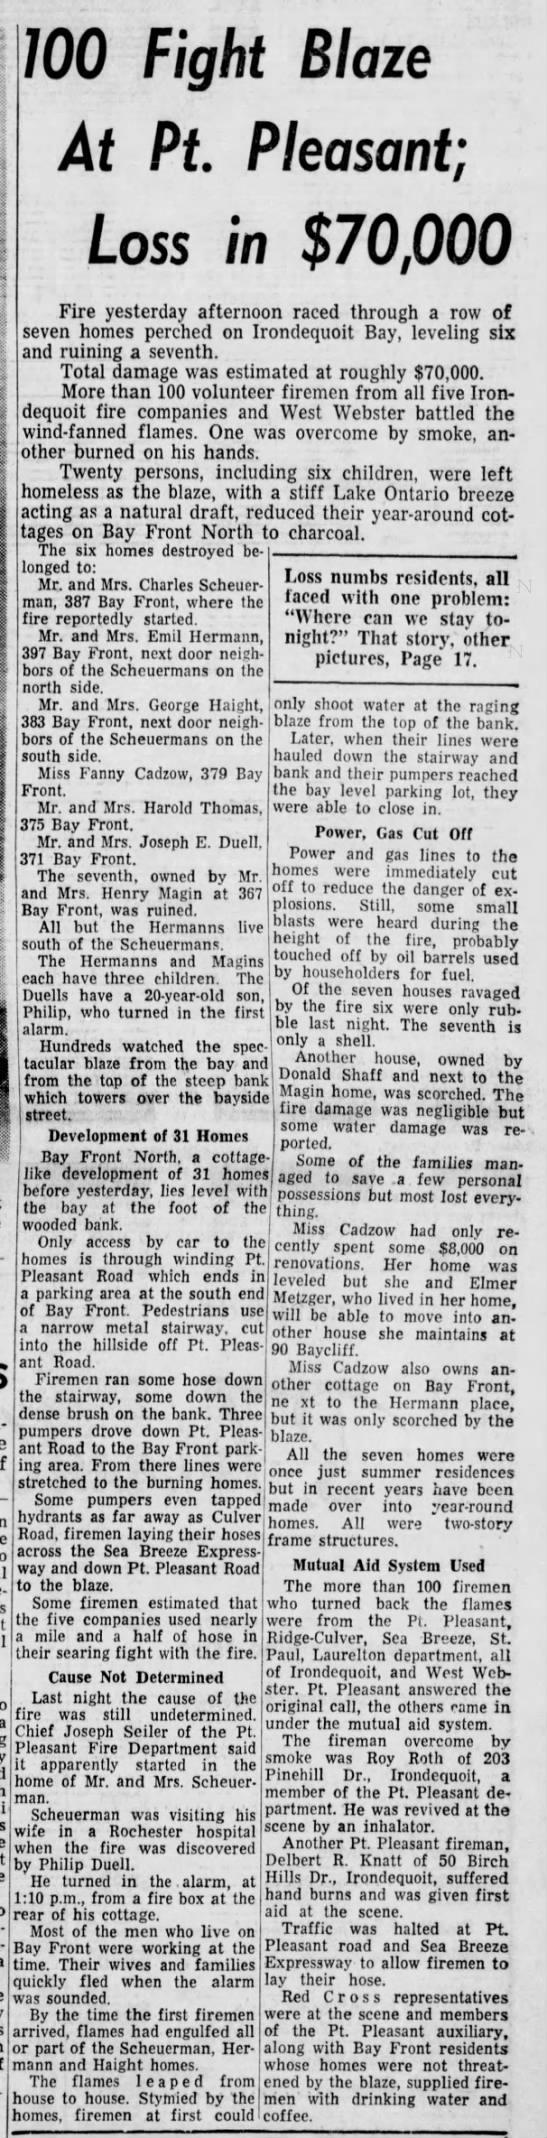 August 13, 1957 Part 3 -